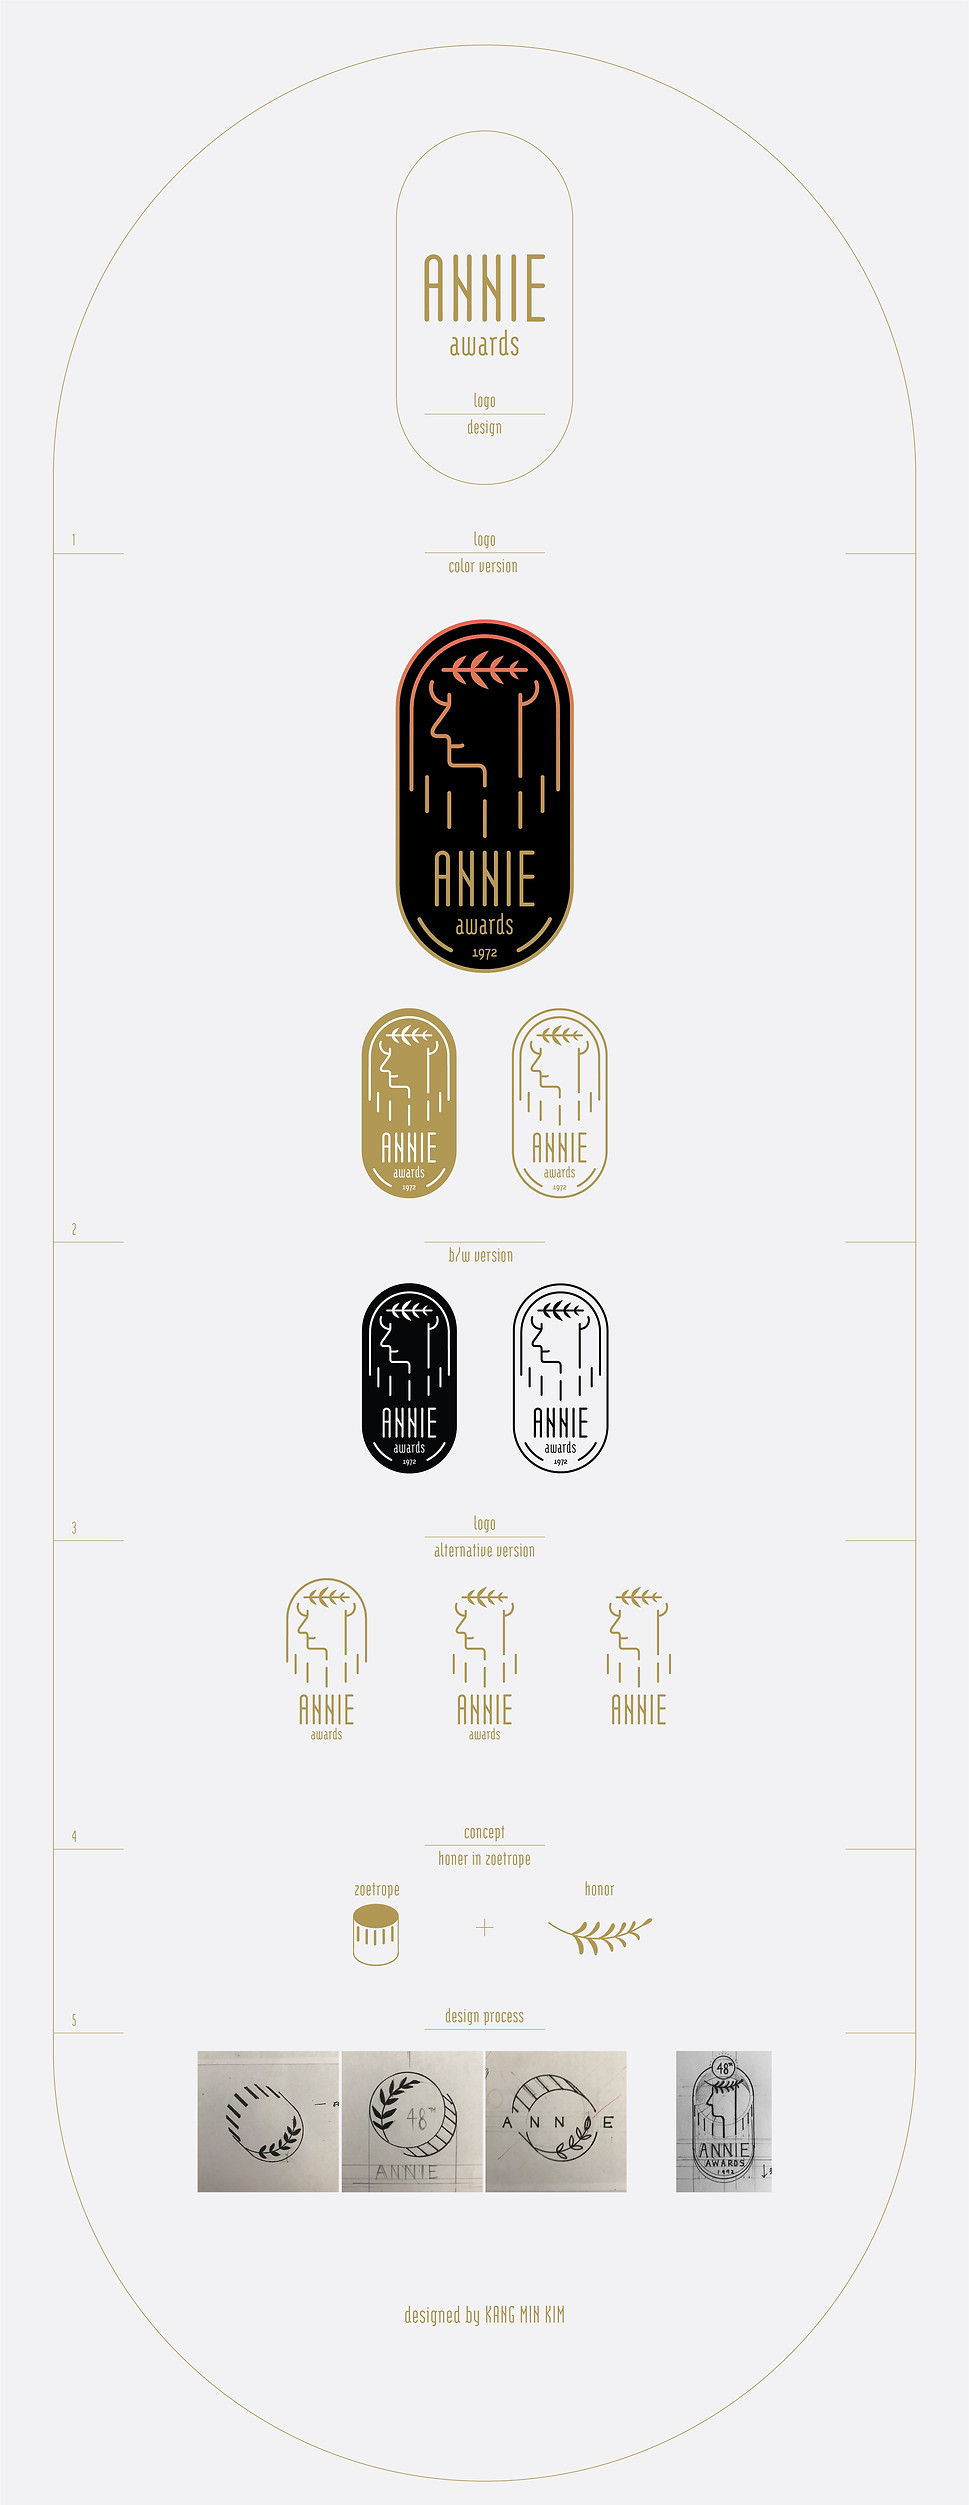 branding board_v02-01-01.jpg